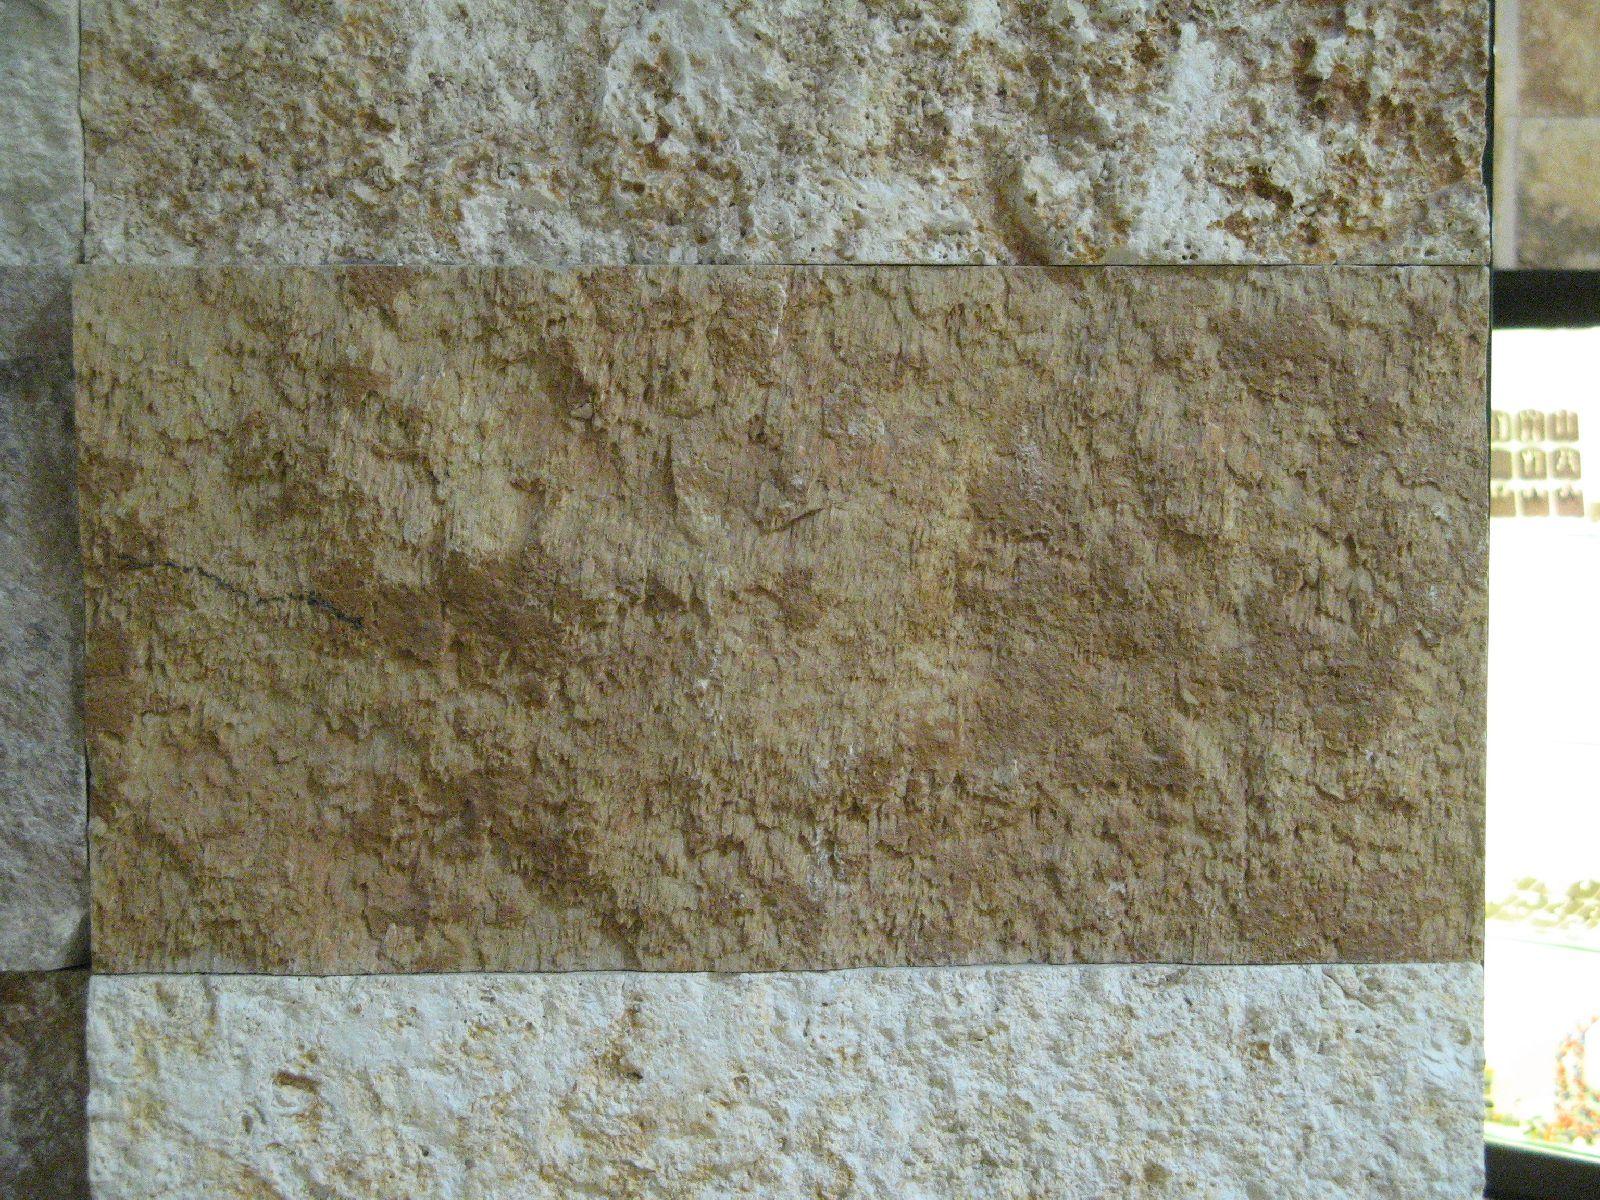 Stone_Texture_B_3708